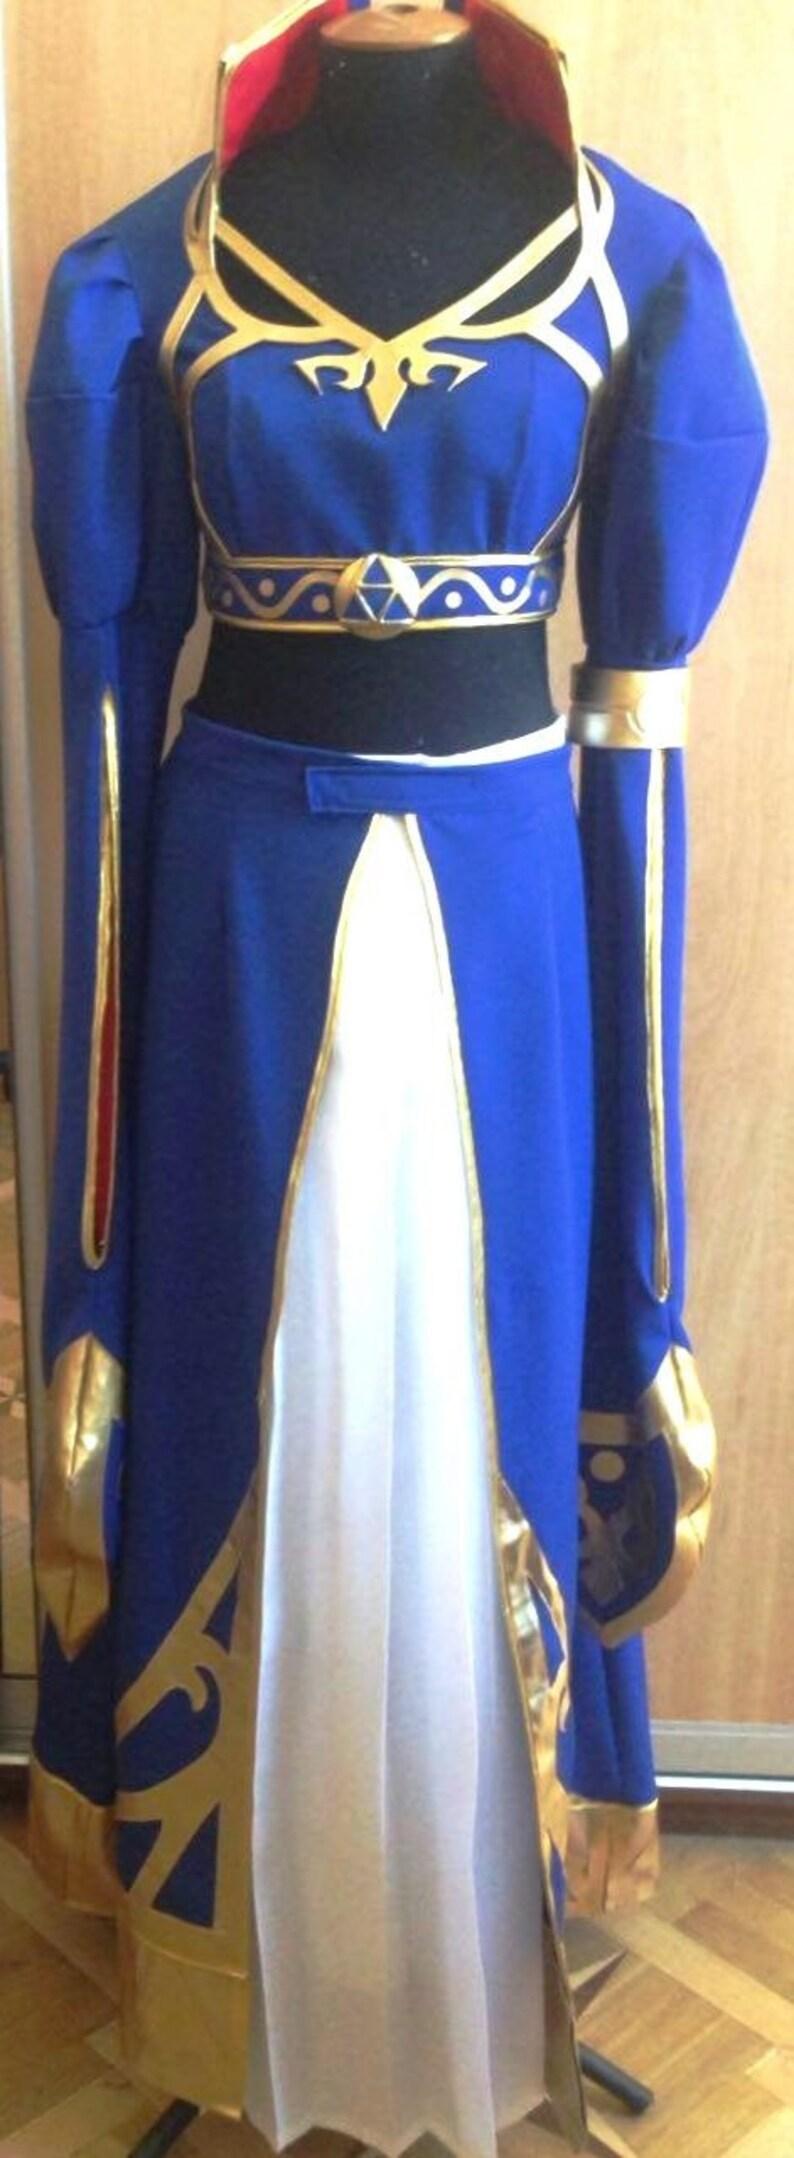 Princess Zelda Breath Of The Wild Royal Dress Zelda Botw Zelda Botw Costume Zelda Botw Cosplay Costume